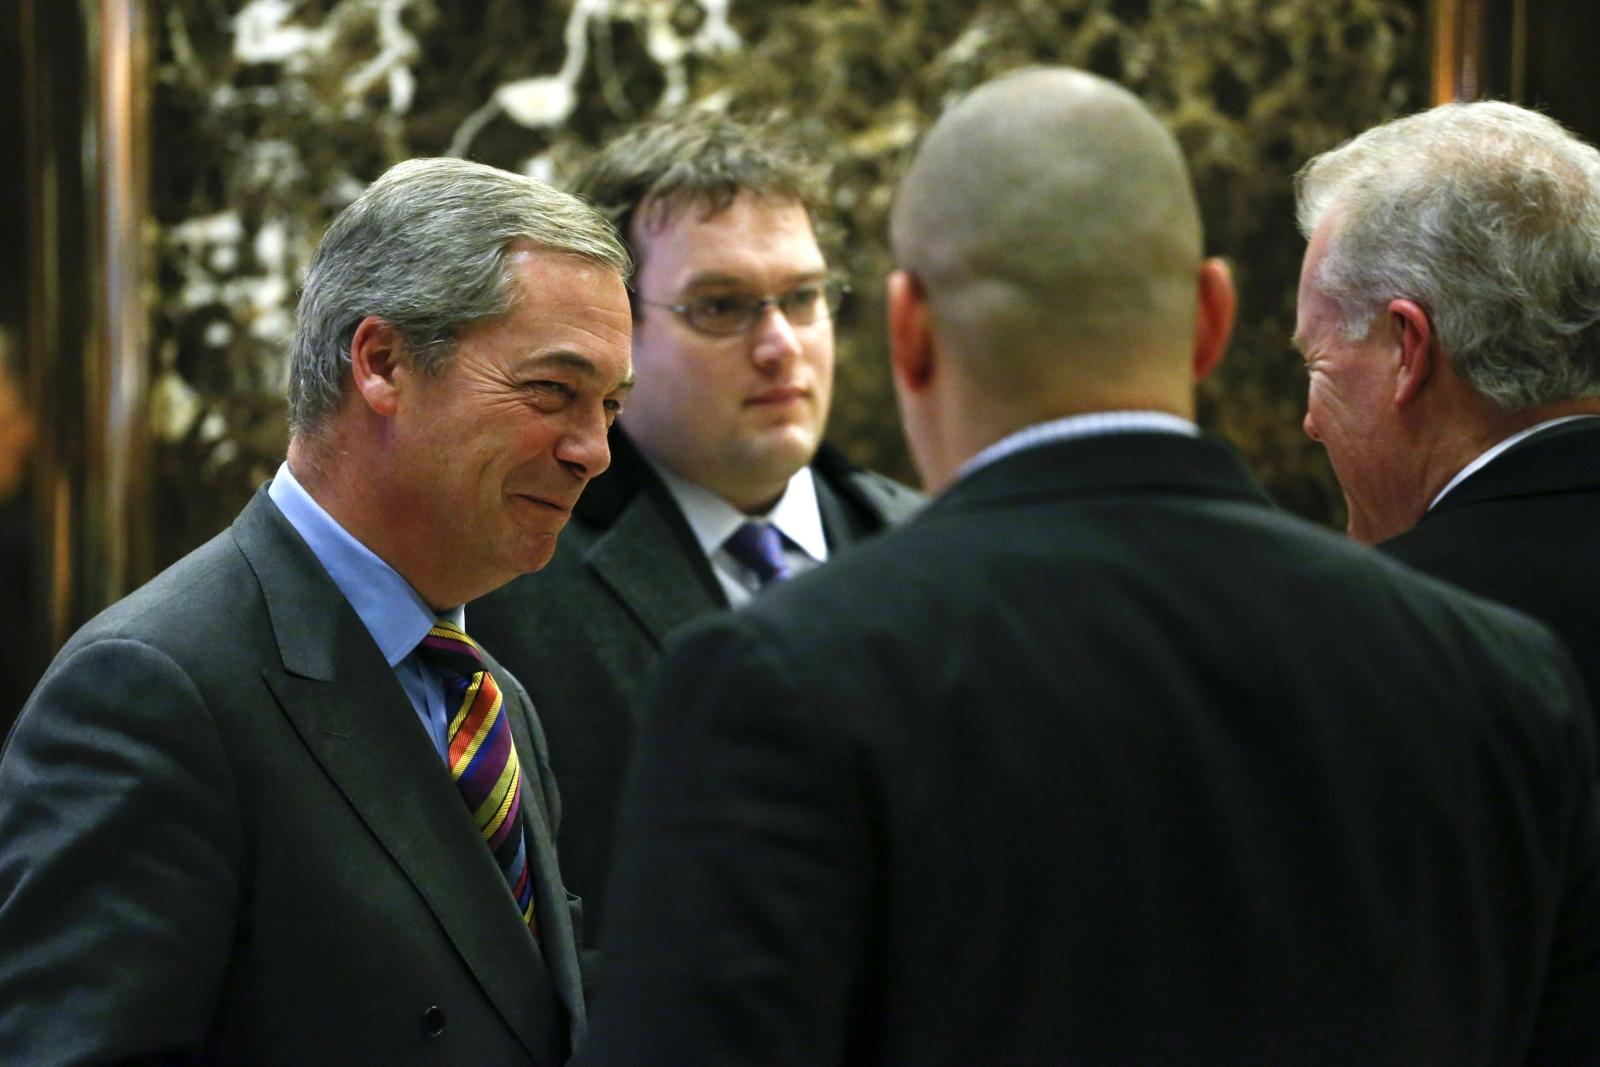 Nigel Farage leaves Trump Tower